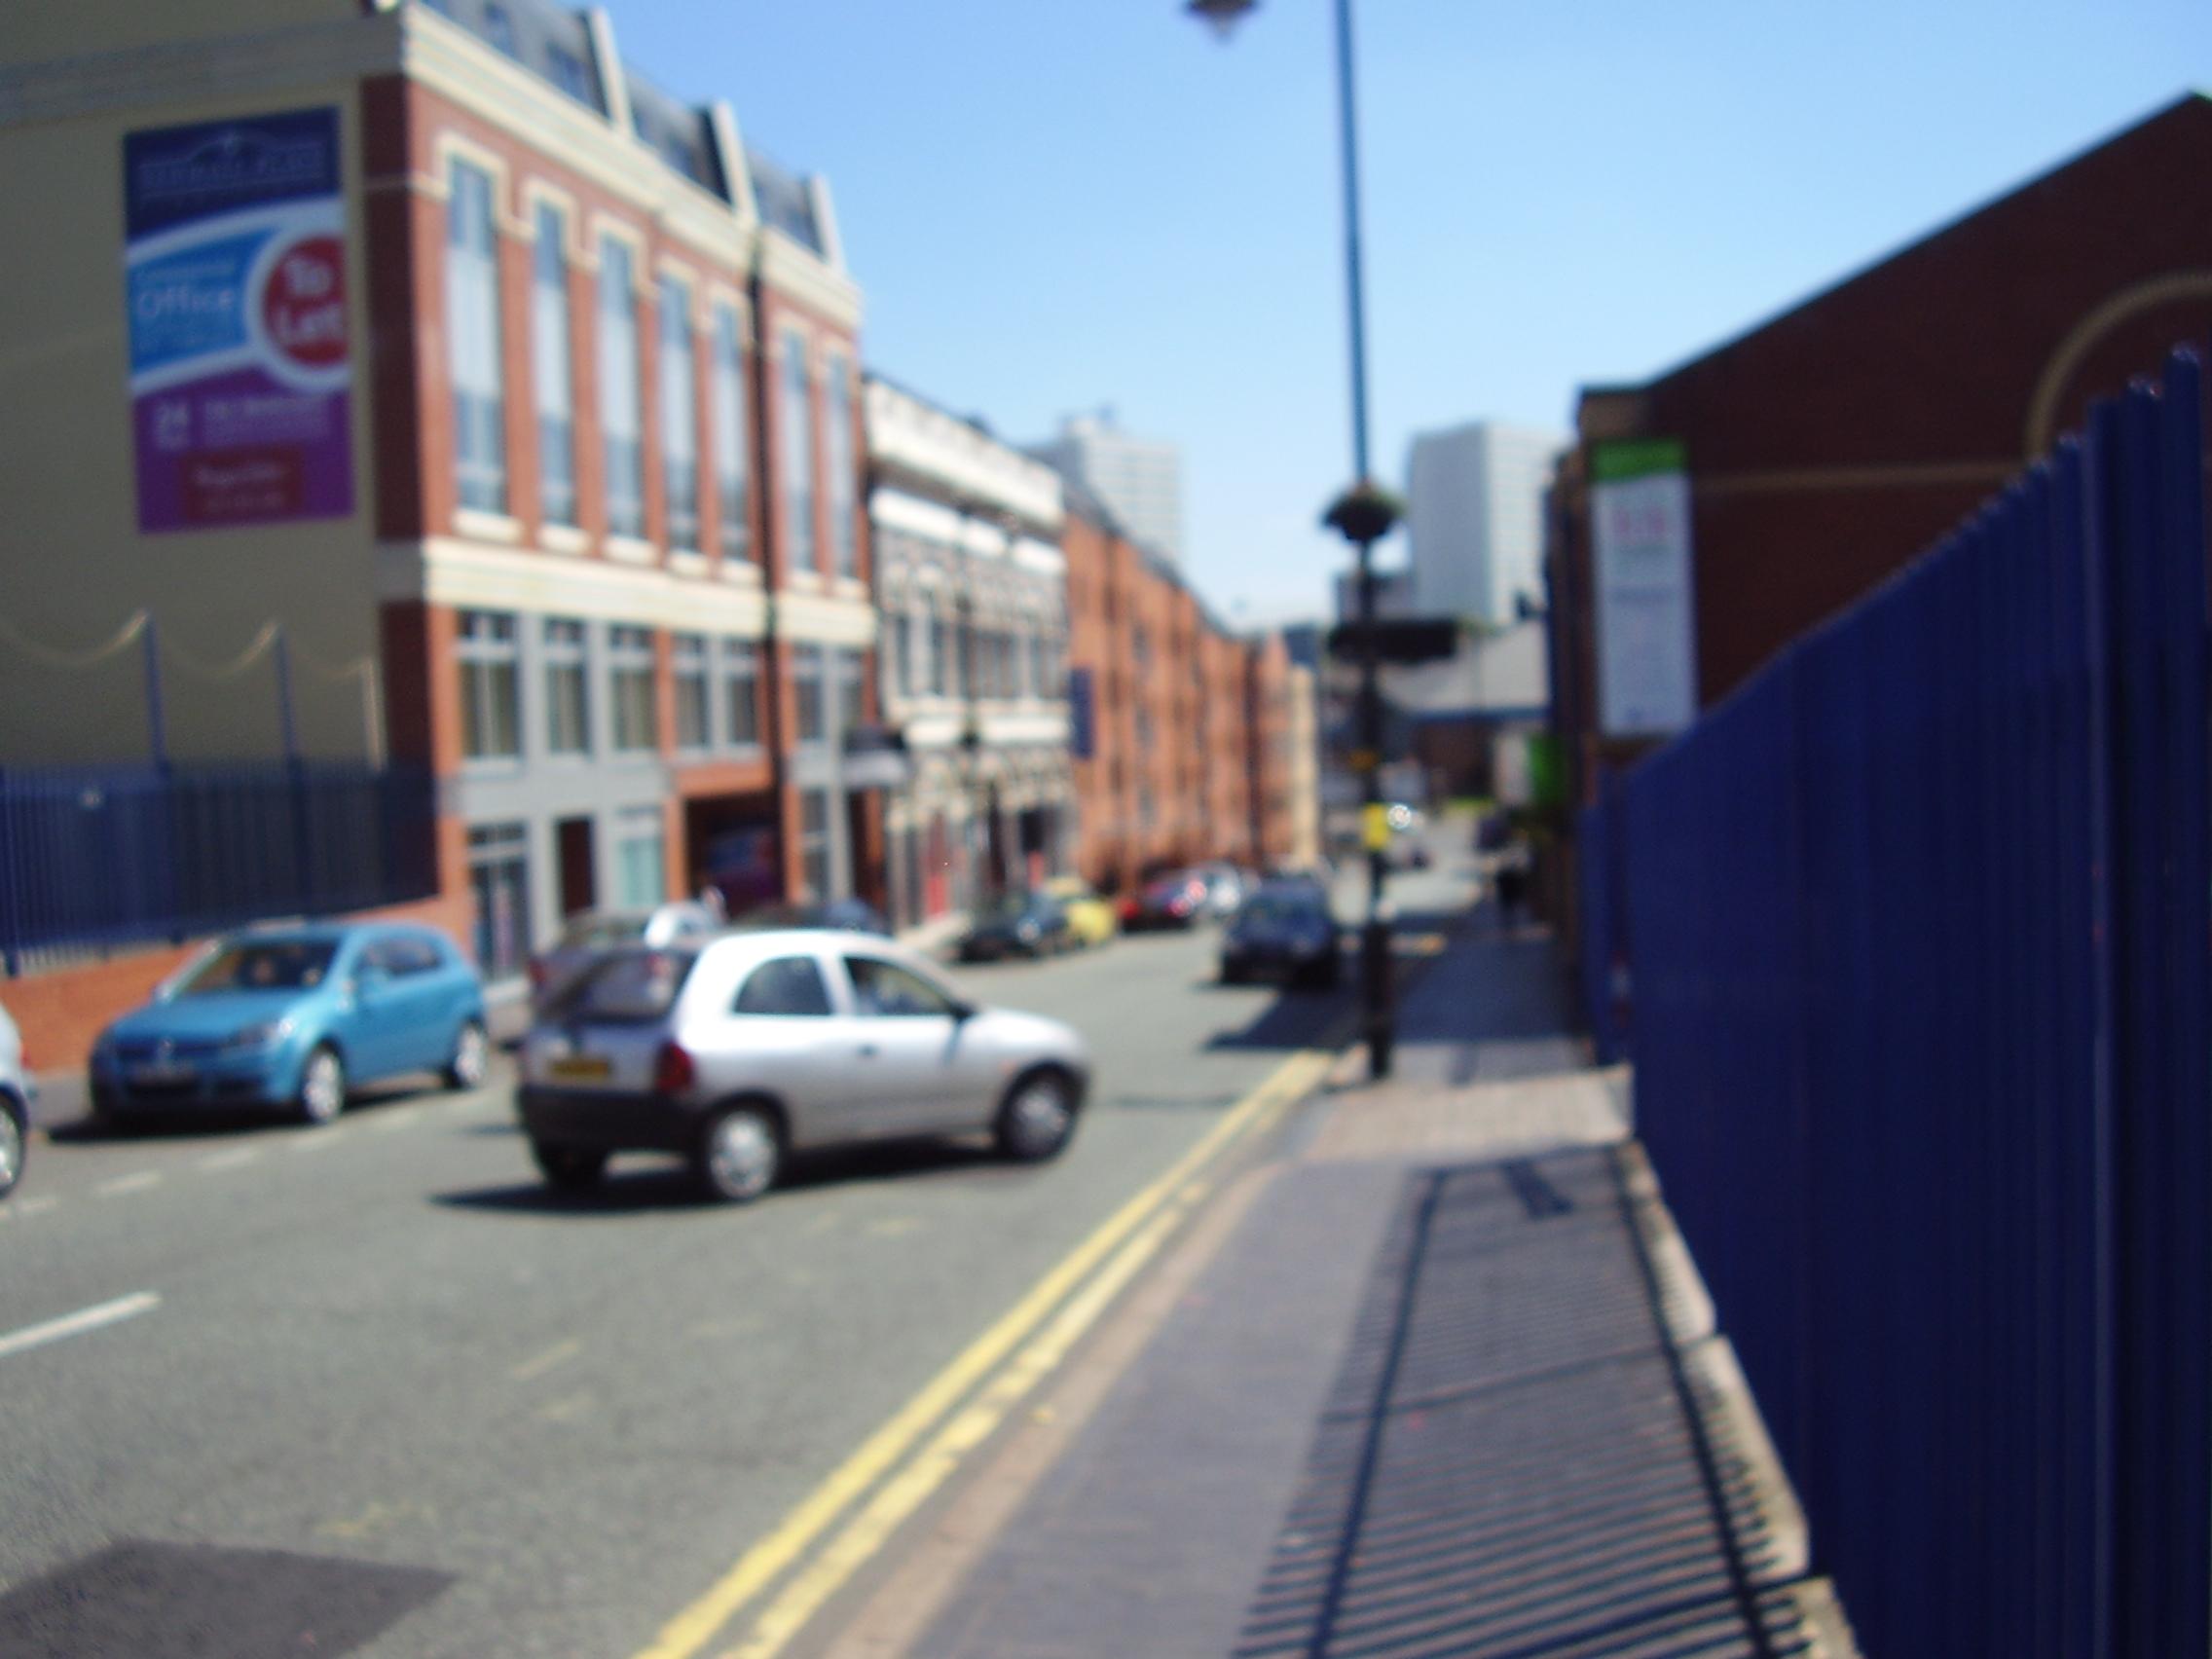 2008 Street view photo 18 of St Pauls Square Area of the Jewellery Quarter Birmingham